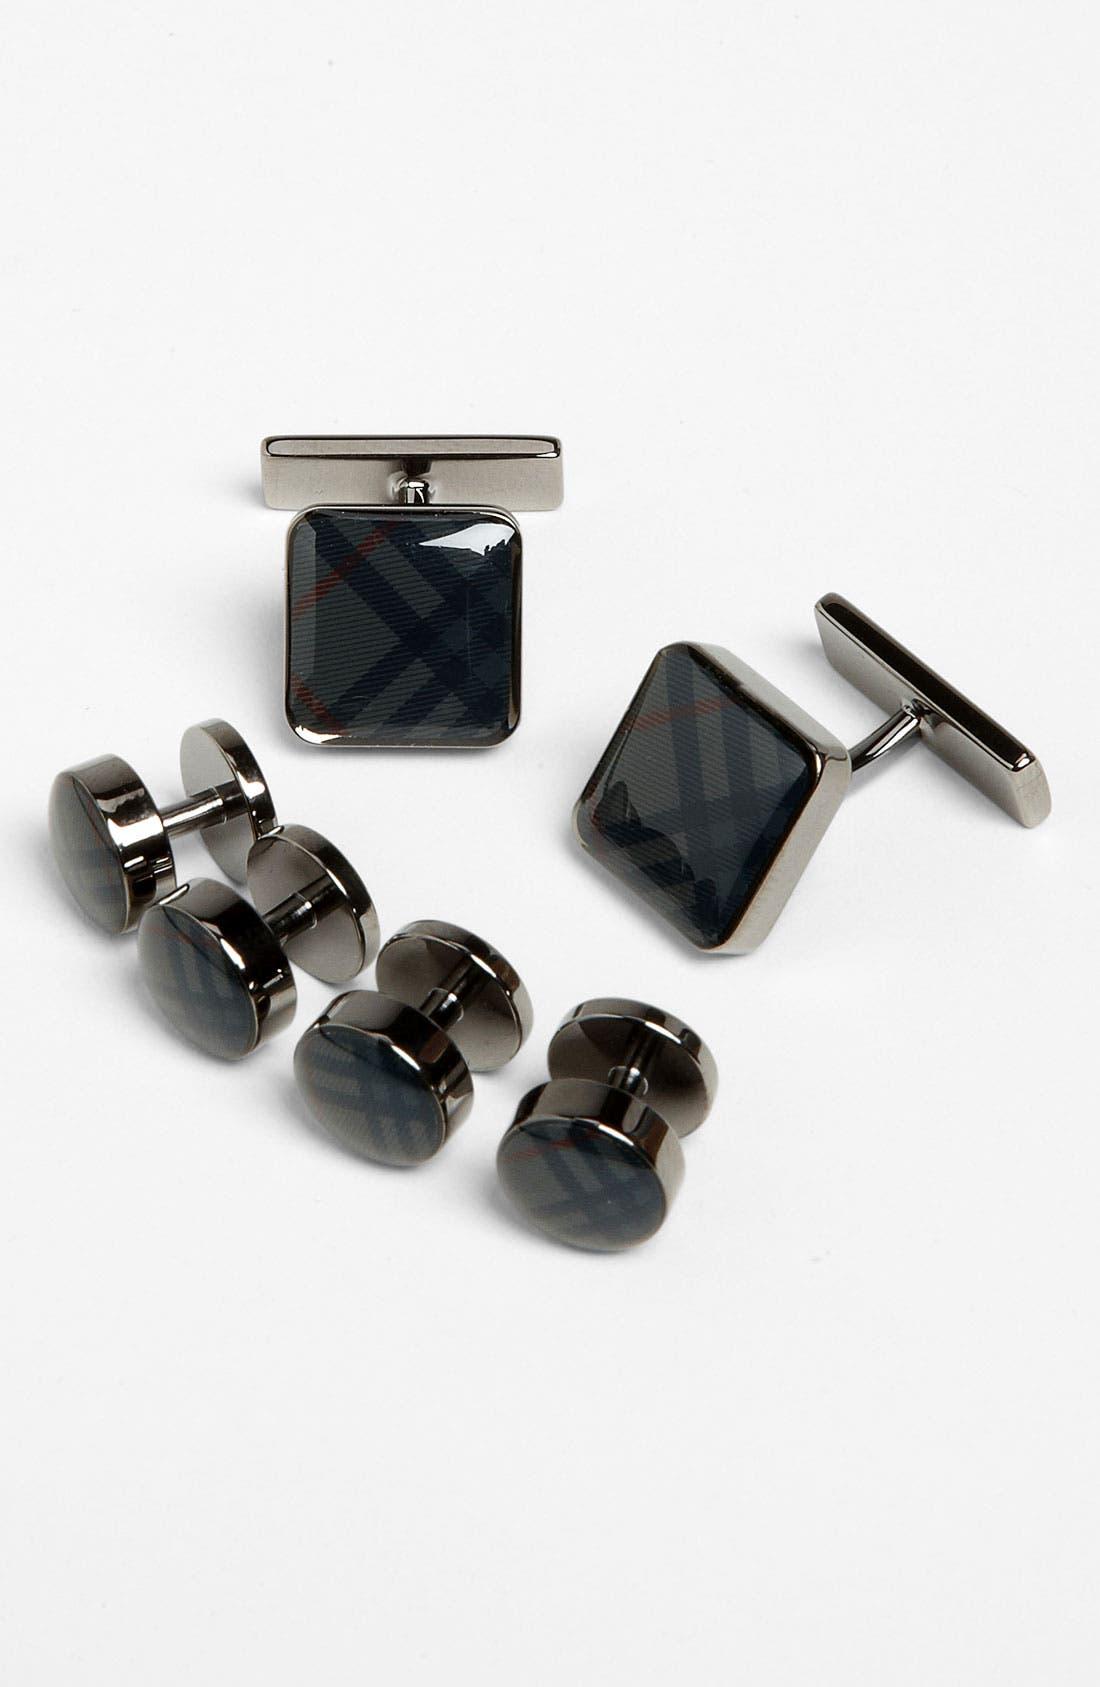 Main Image - Burberry Cuff Links & Shirt Stud Set